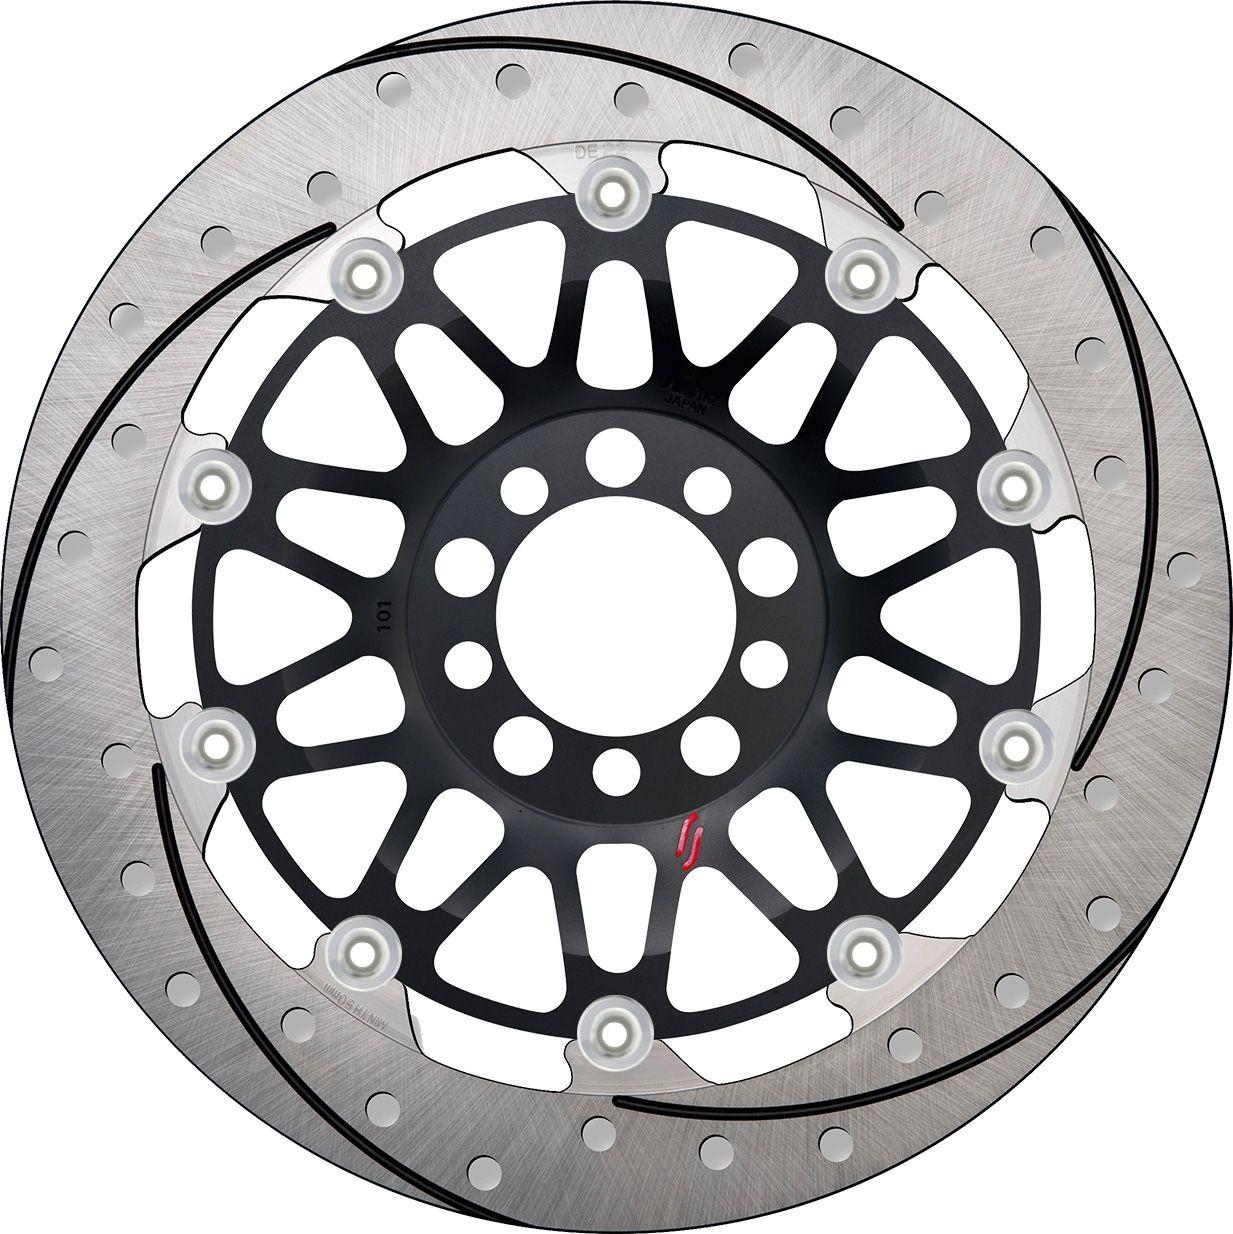 【SUNSTAR】Premium Racing 前煞車碟盤 - 「Webike-摩托百貨」